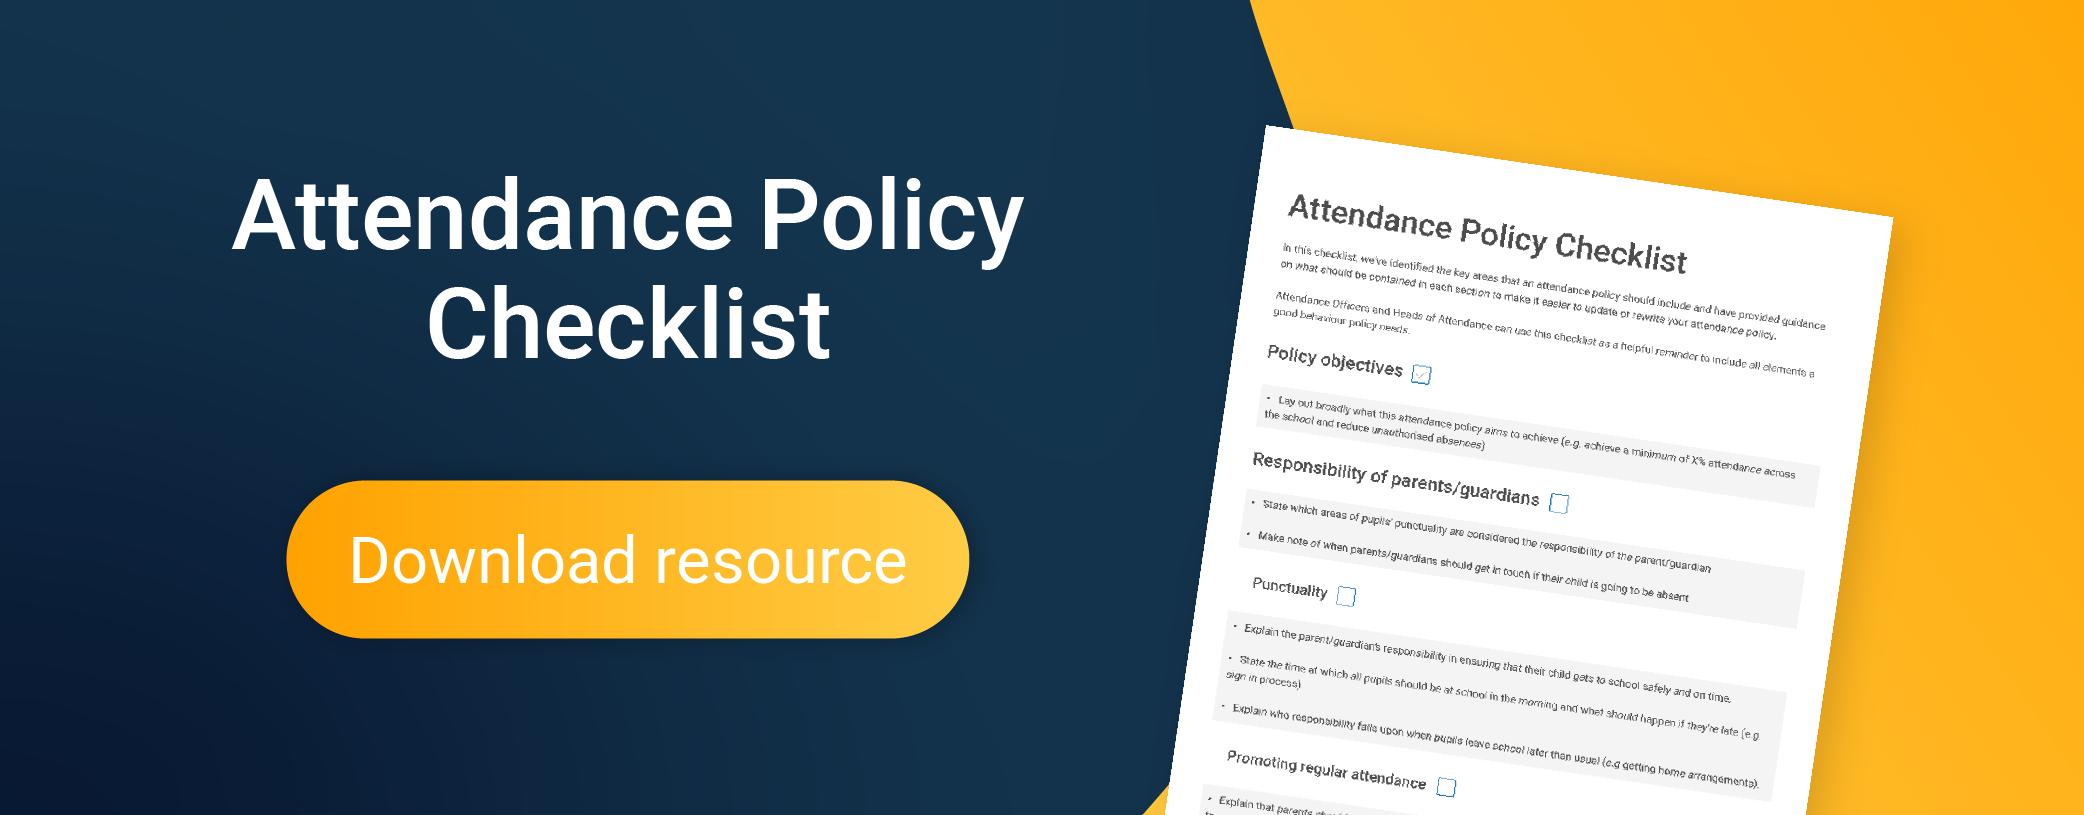 Attendance policy checklist download